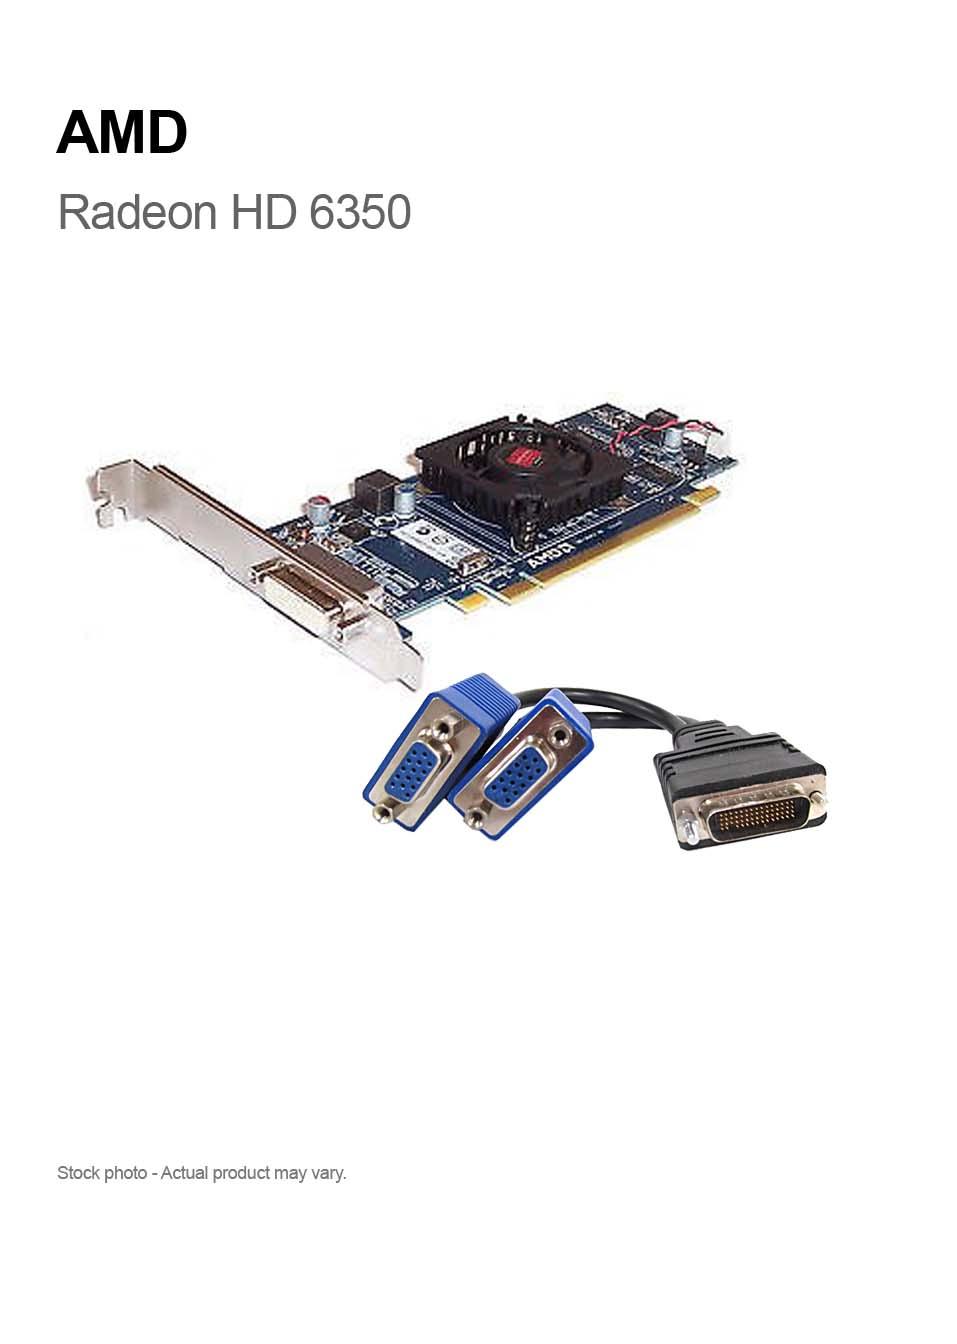 amd radeon hd 6350 driver windows 7 32 bit